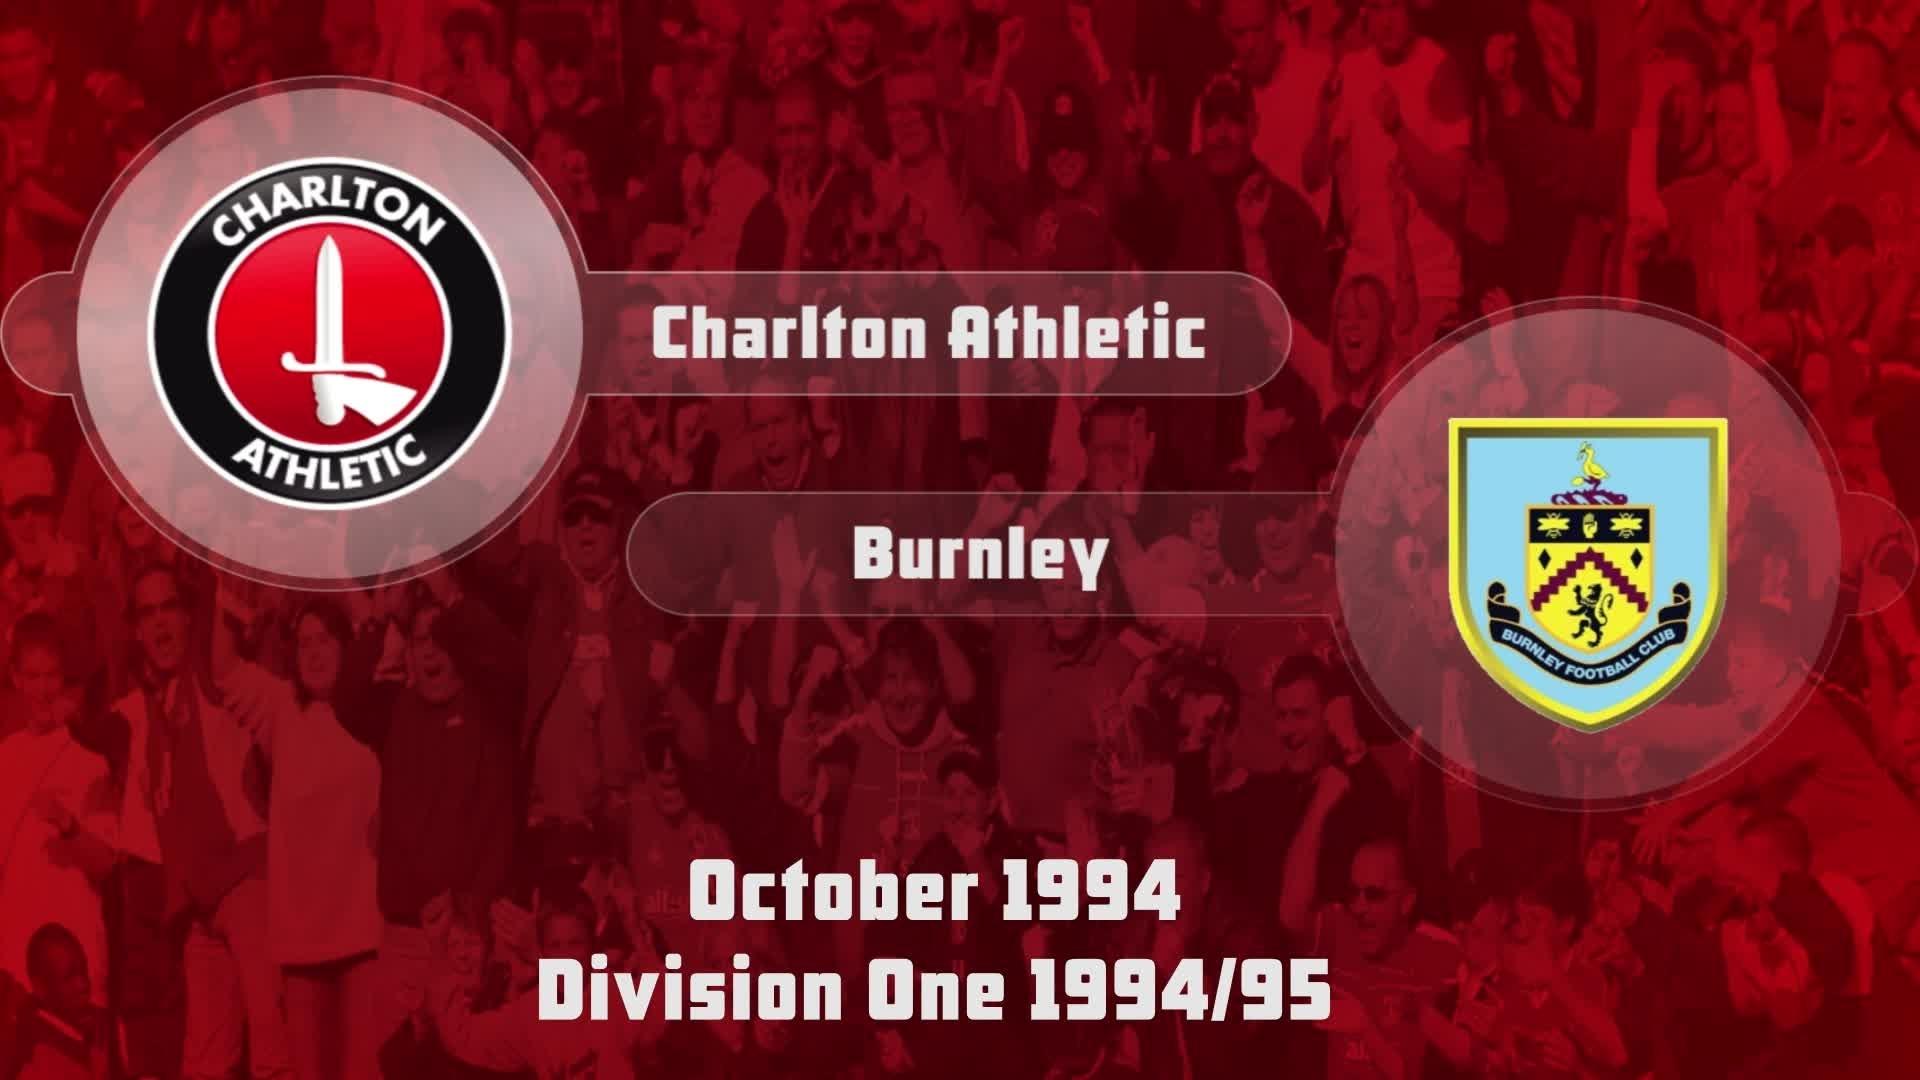 15 HIGHLIGHTS | Charlton 1 Burnley 2 (Oct 1994)